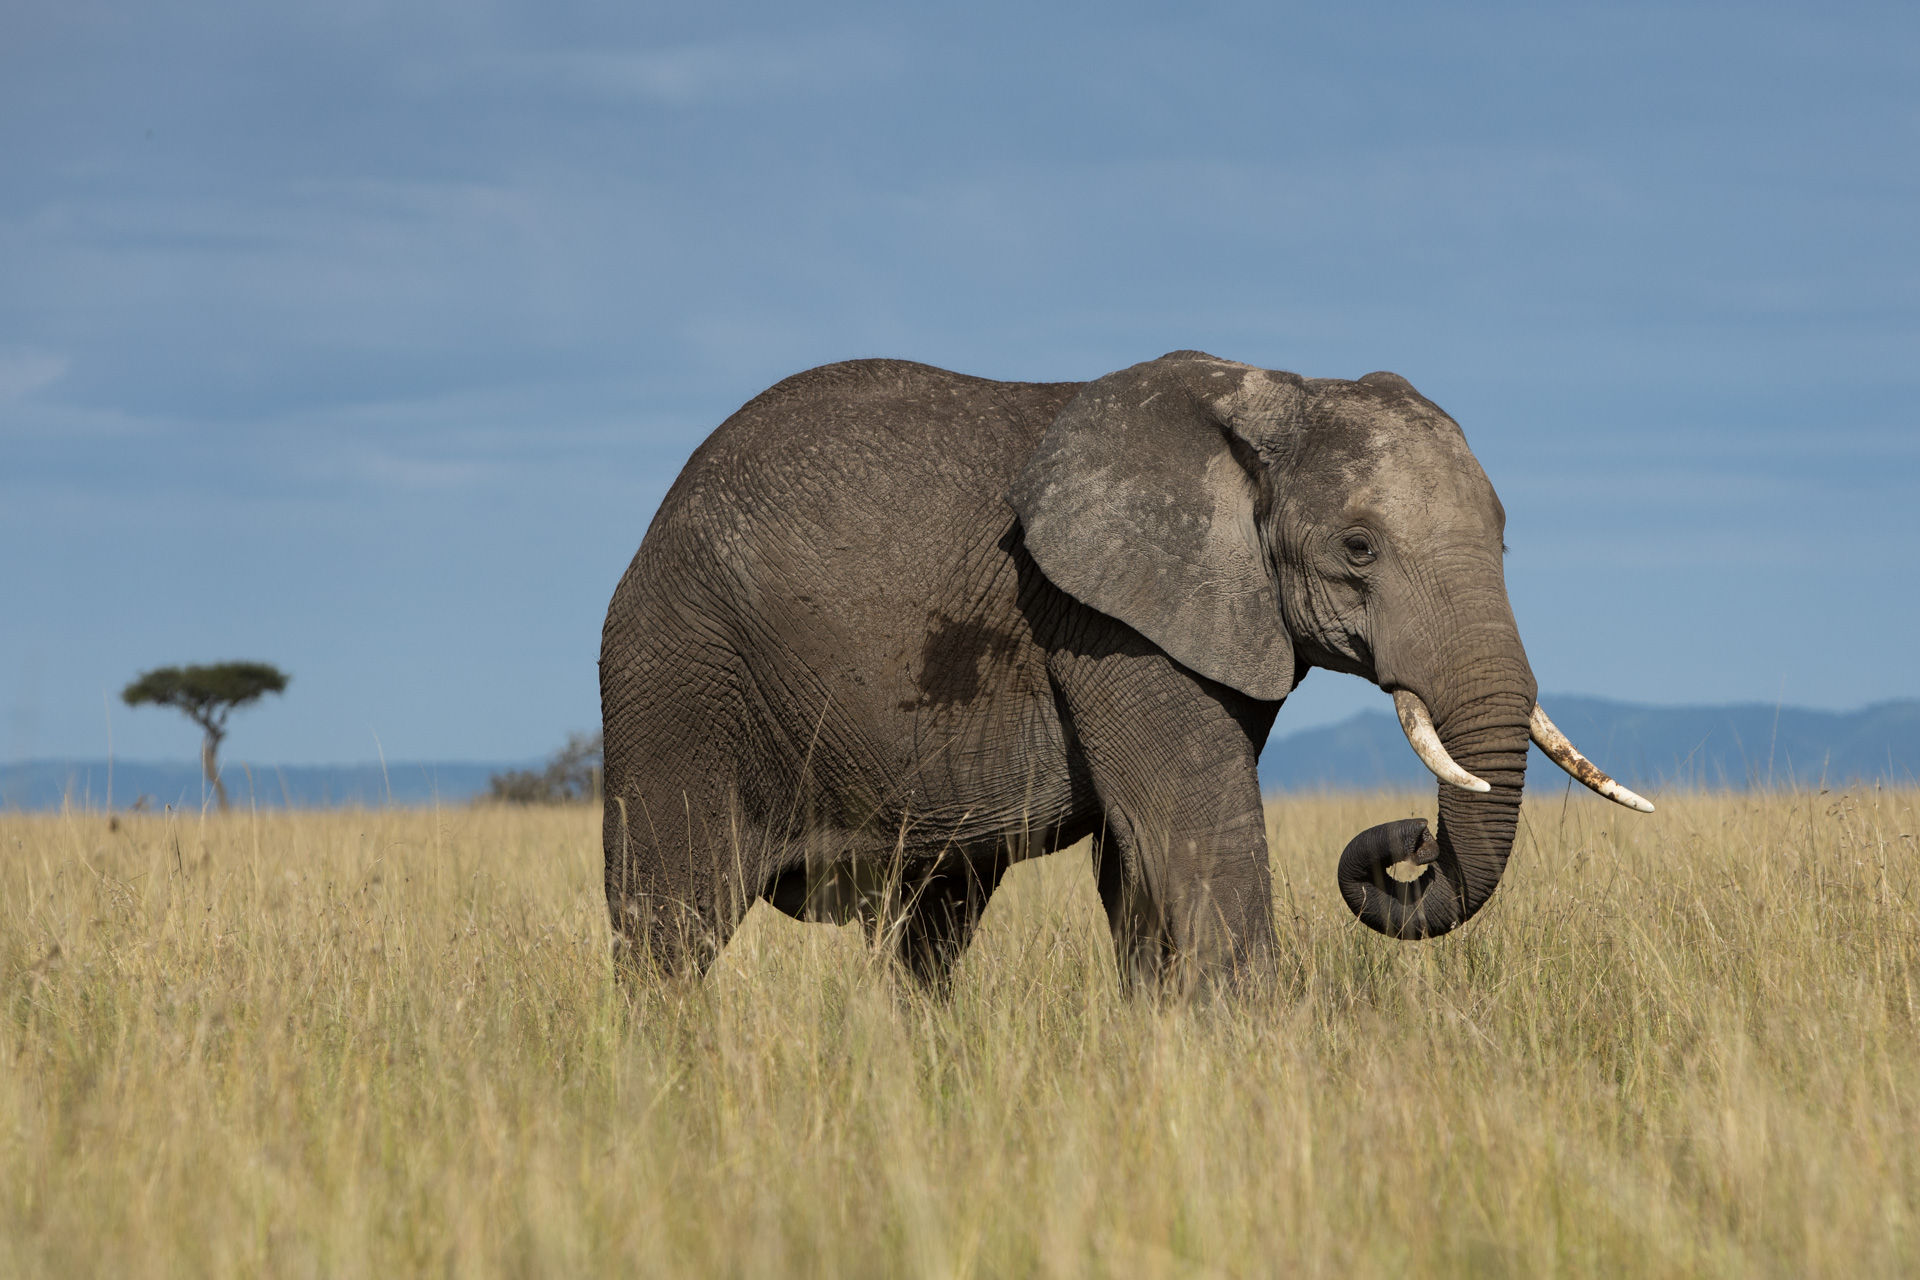 Elephant in grass